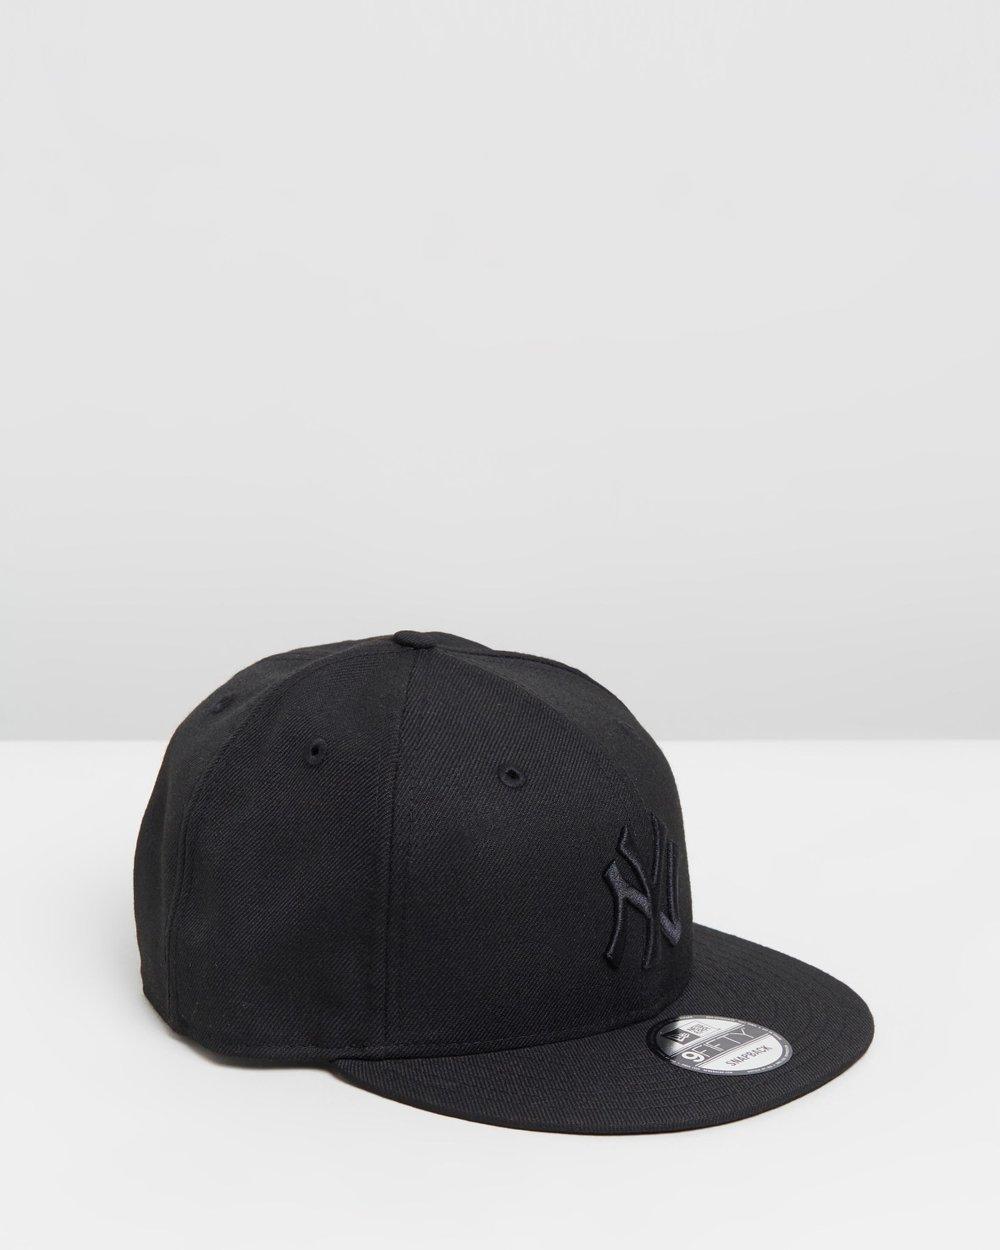 ded6b699610 950 New York Yankees Cap by New Era Online